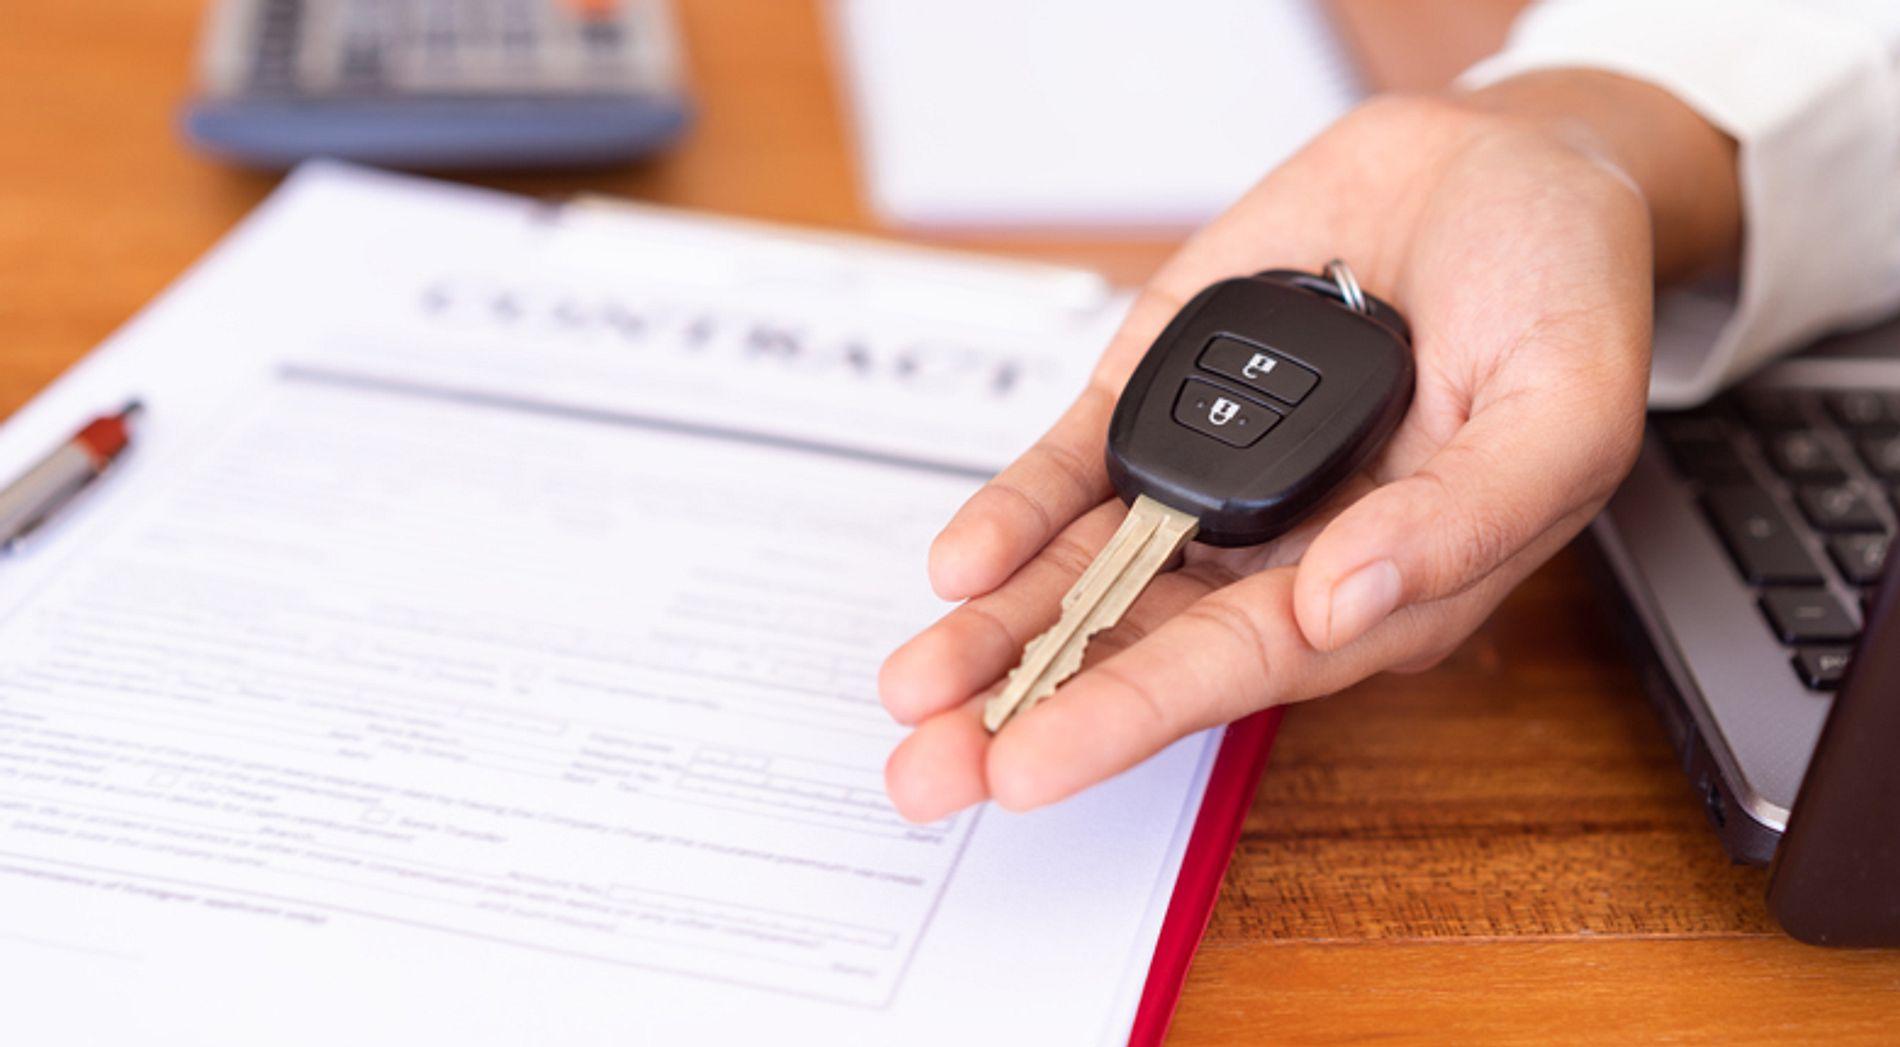 holding car keys